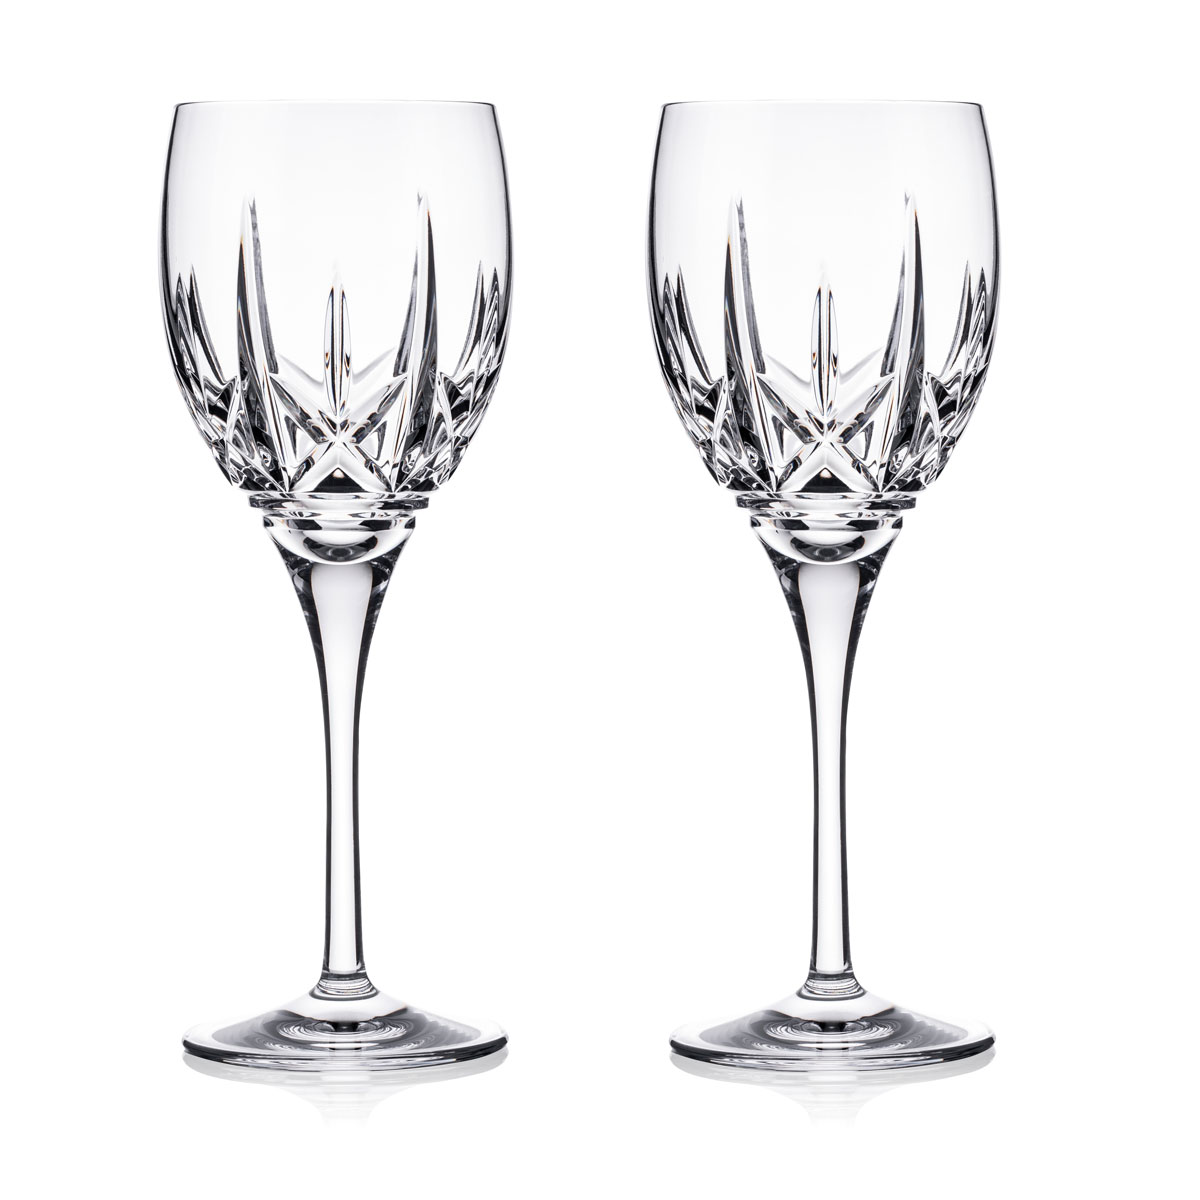 Waterford Crystal Eimer Wine Glasses, Pair